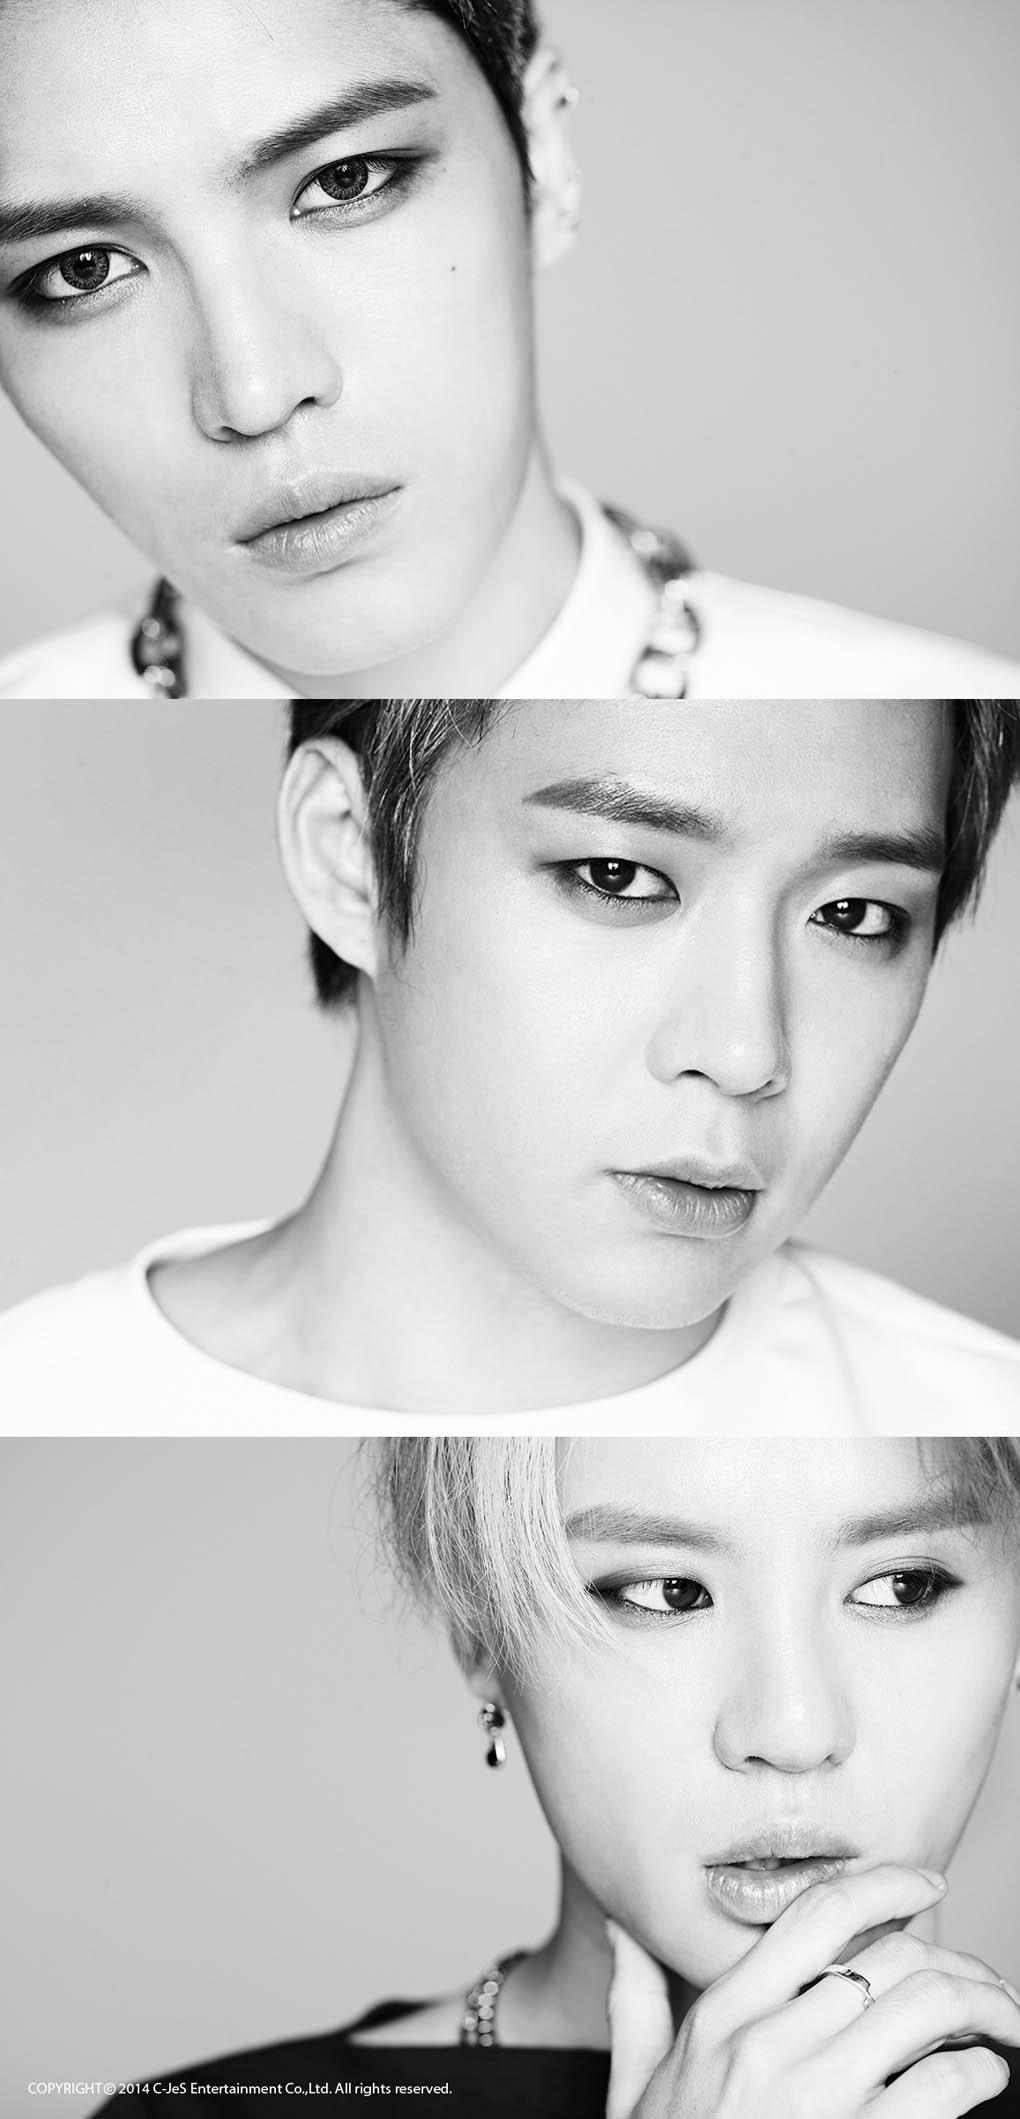 JYJ本月29日發行正規專輯《JUST US》